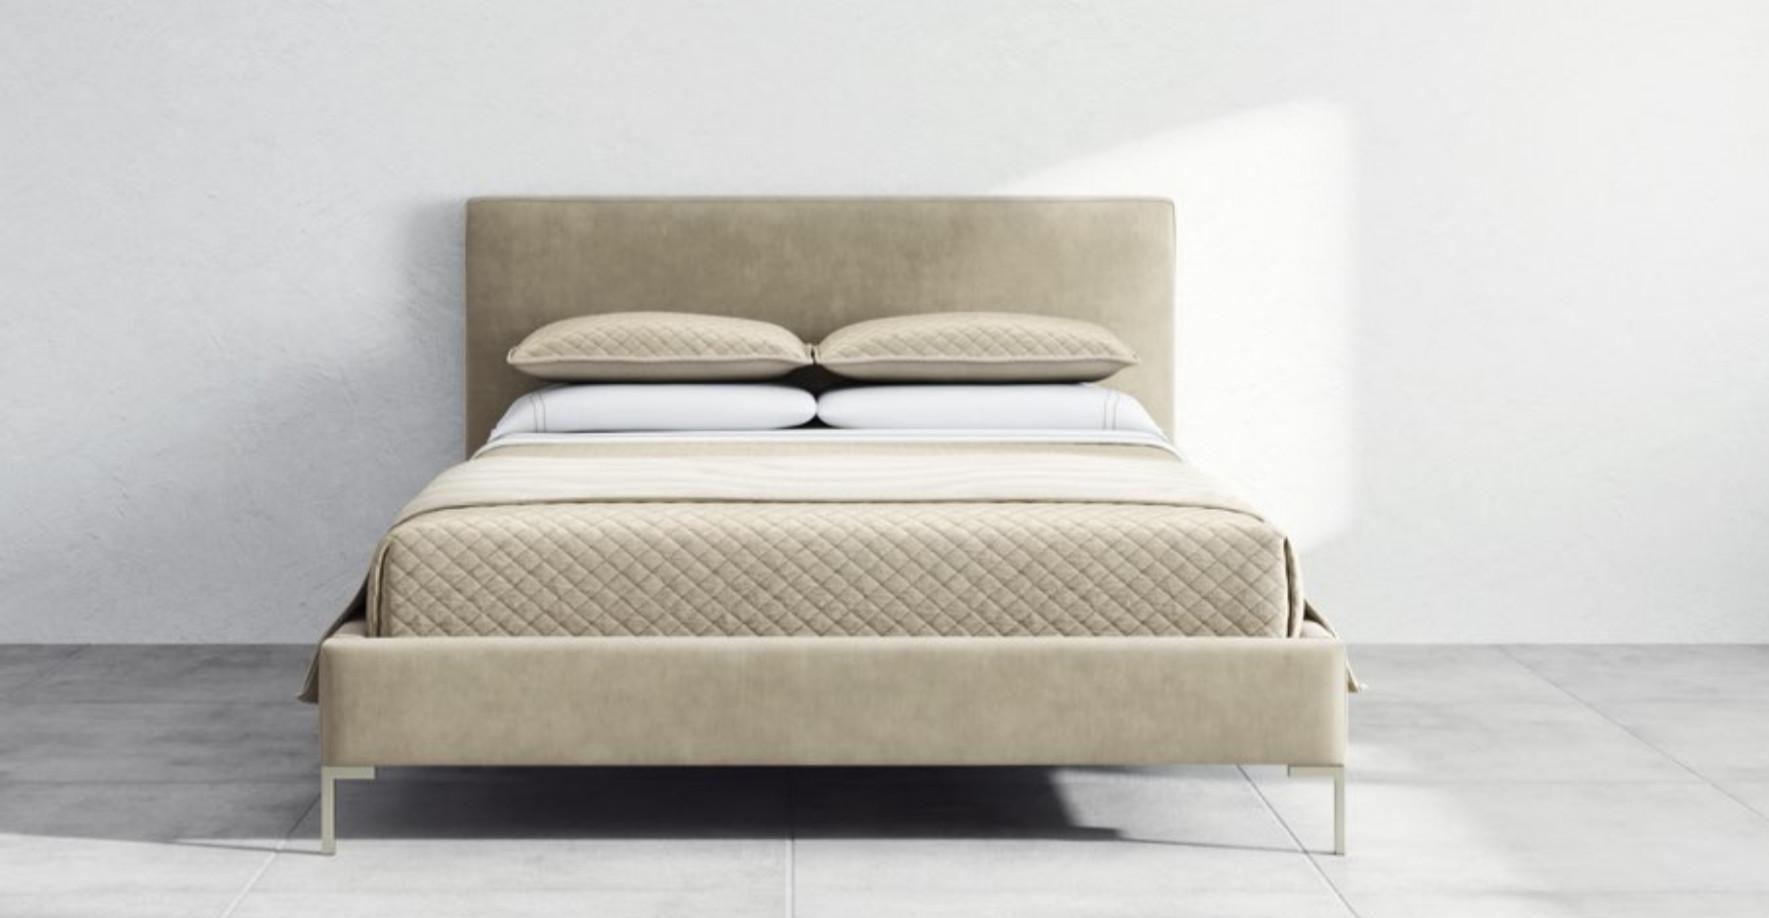 santorini bed frame saatva review